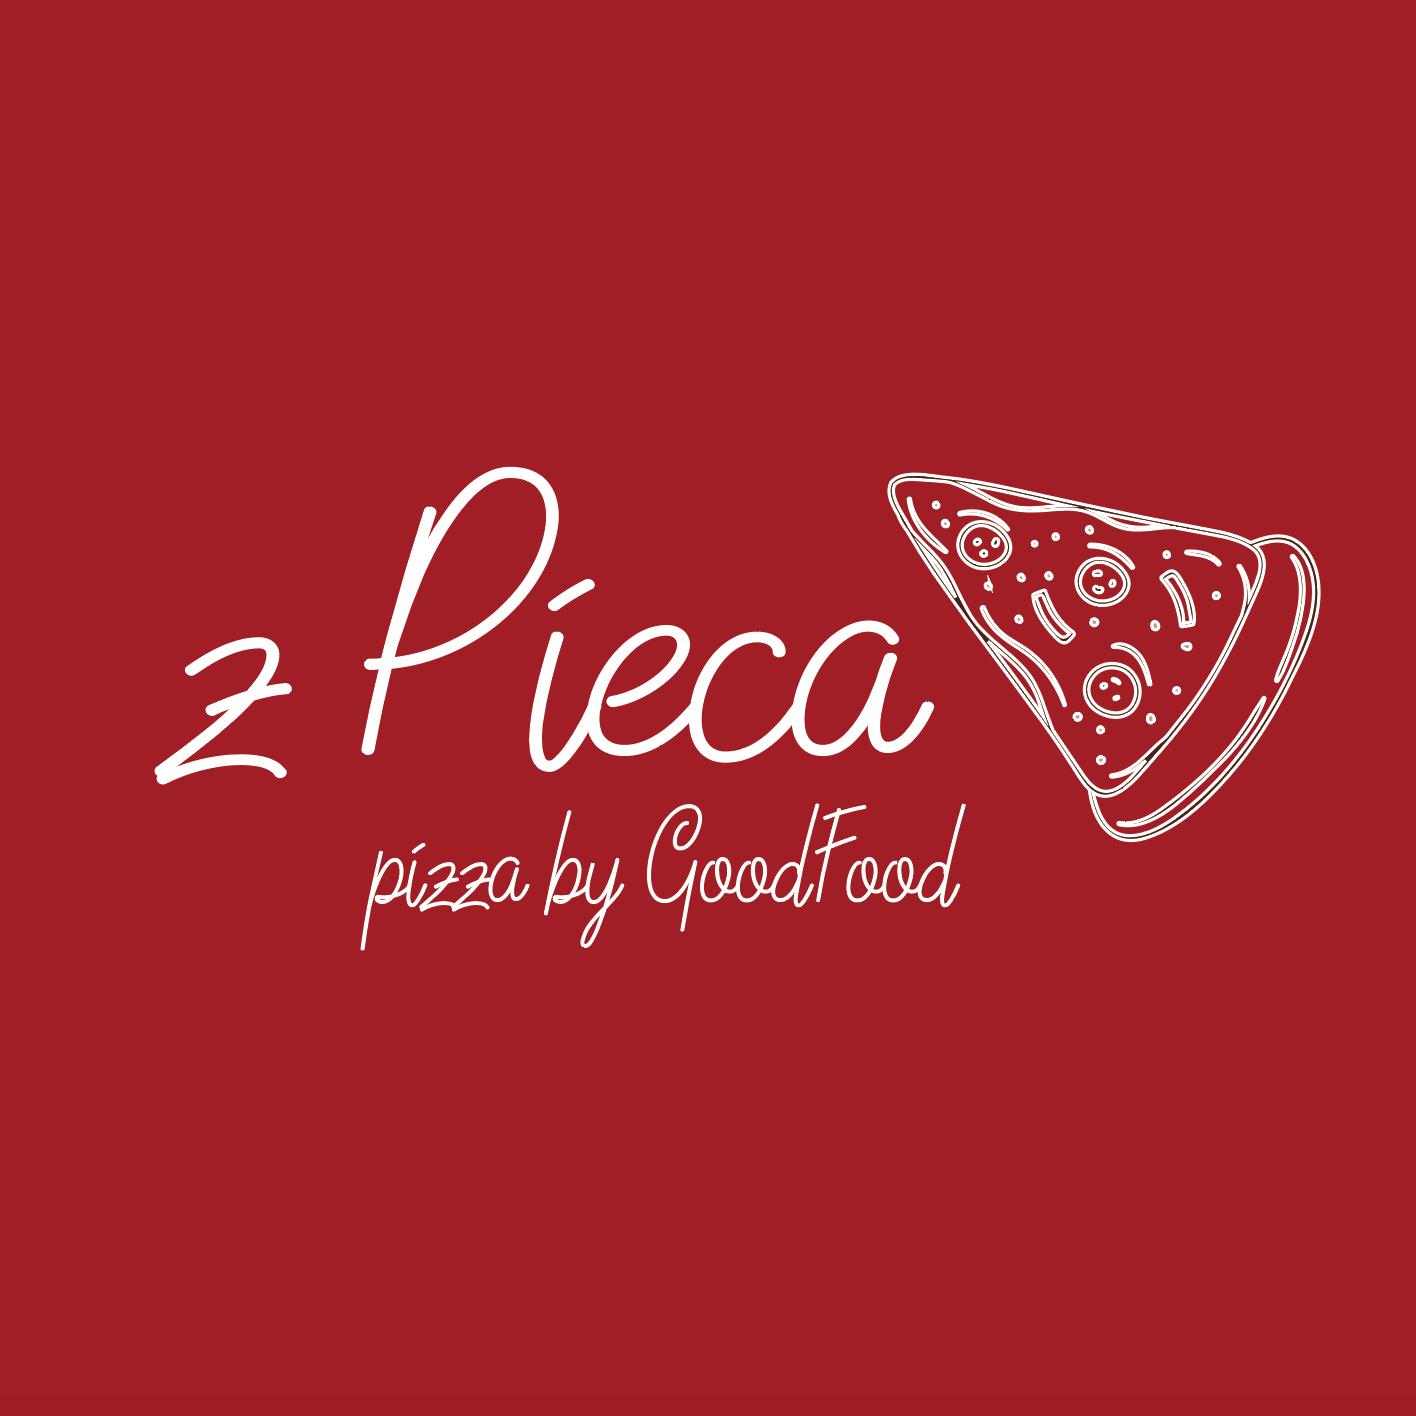 Z Pieca - Pizza by GoodFood